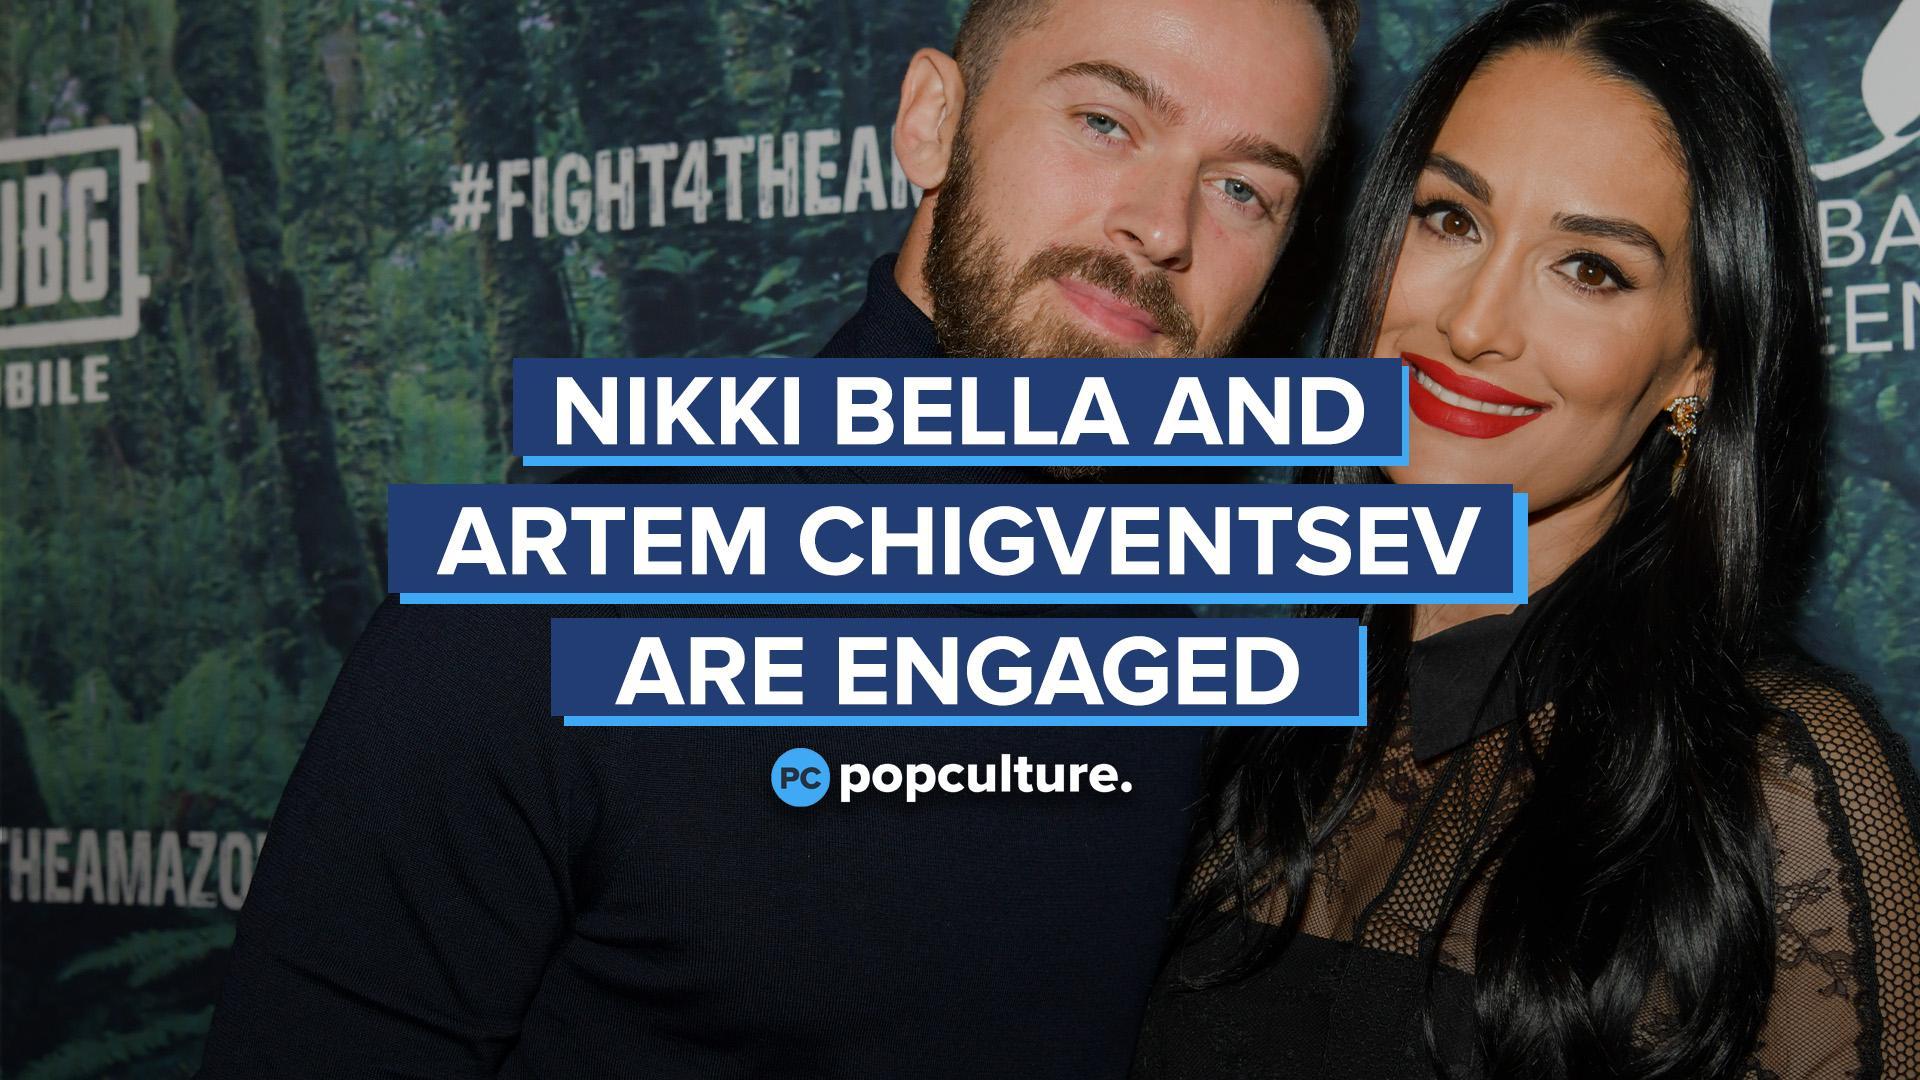 Nikki Bella and Artem Chigventsev Announce Engagement screen capture